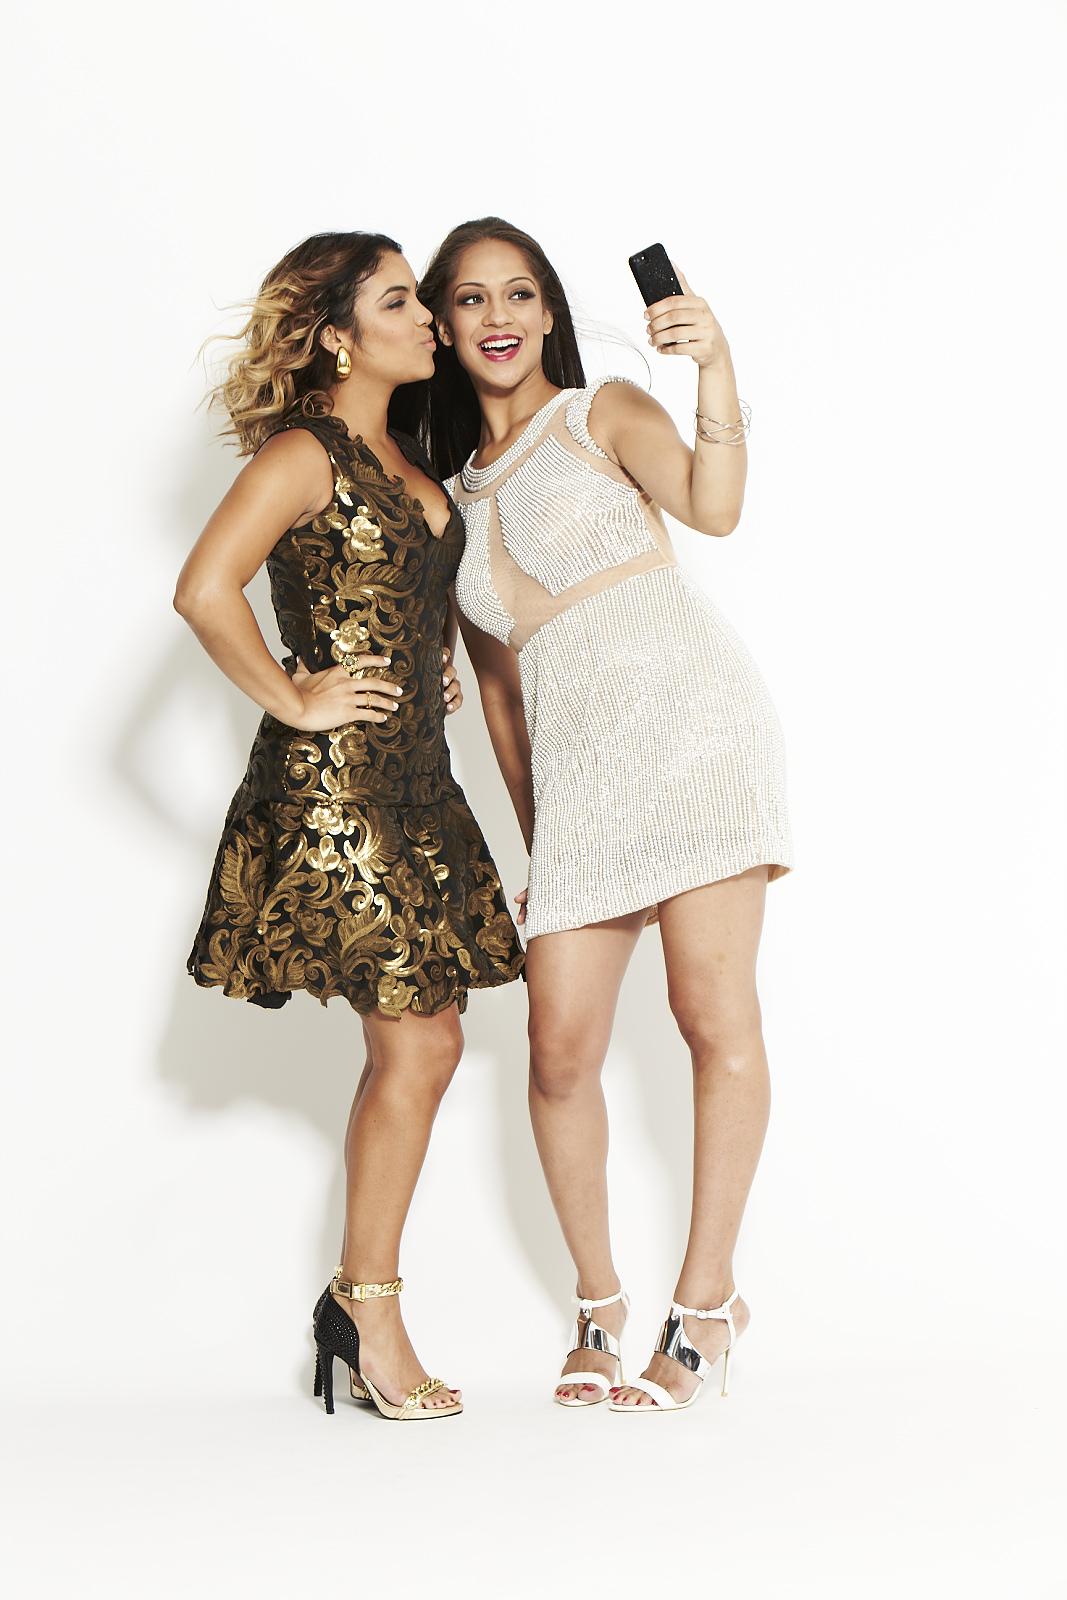 Cosmo for Latinas   Magazine Real Girl Fashion. Photo: Joshua Pestka.